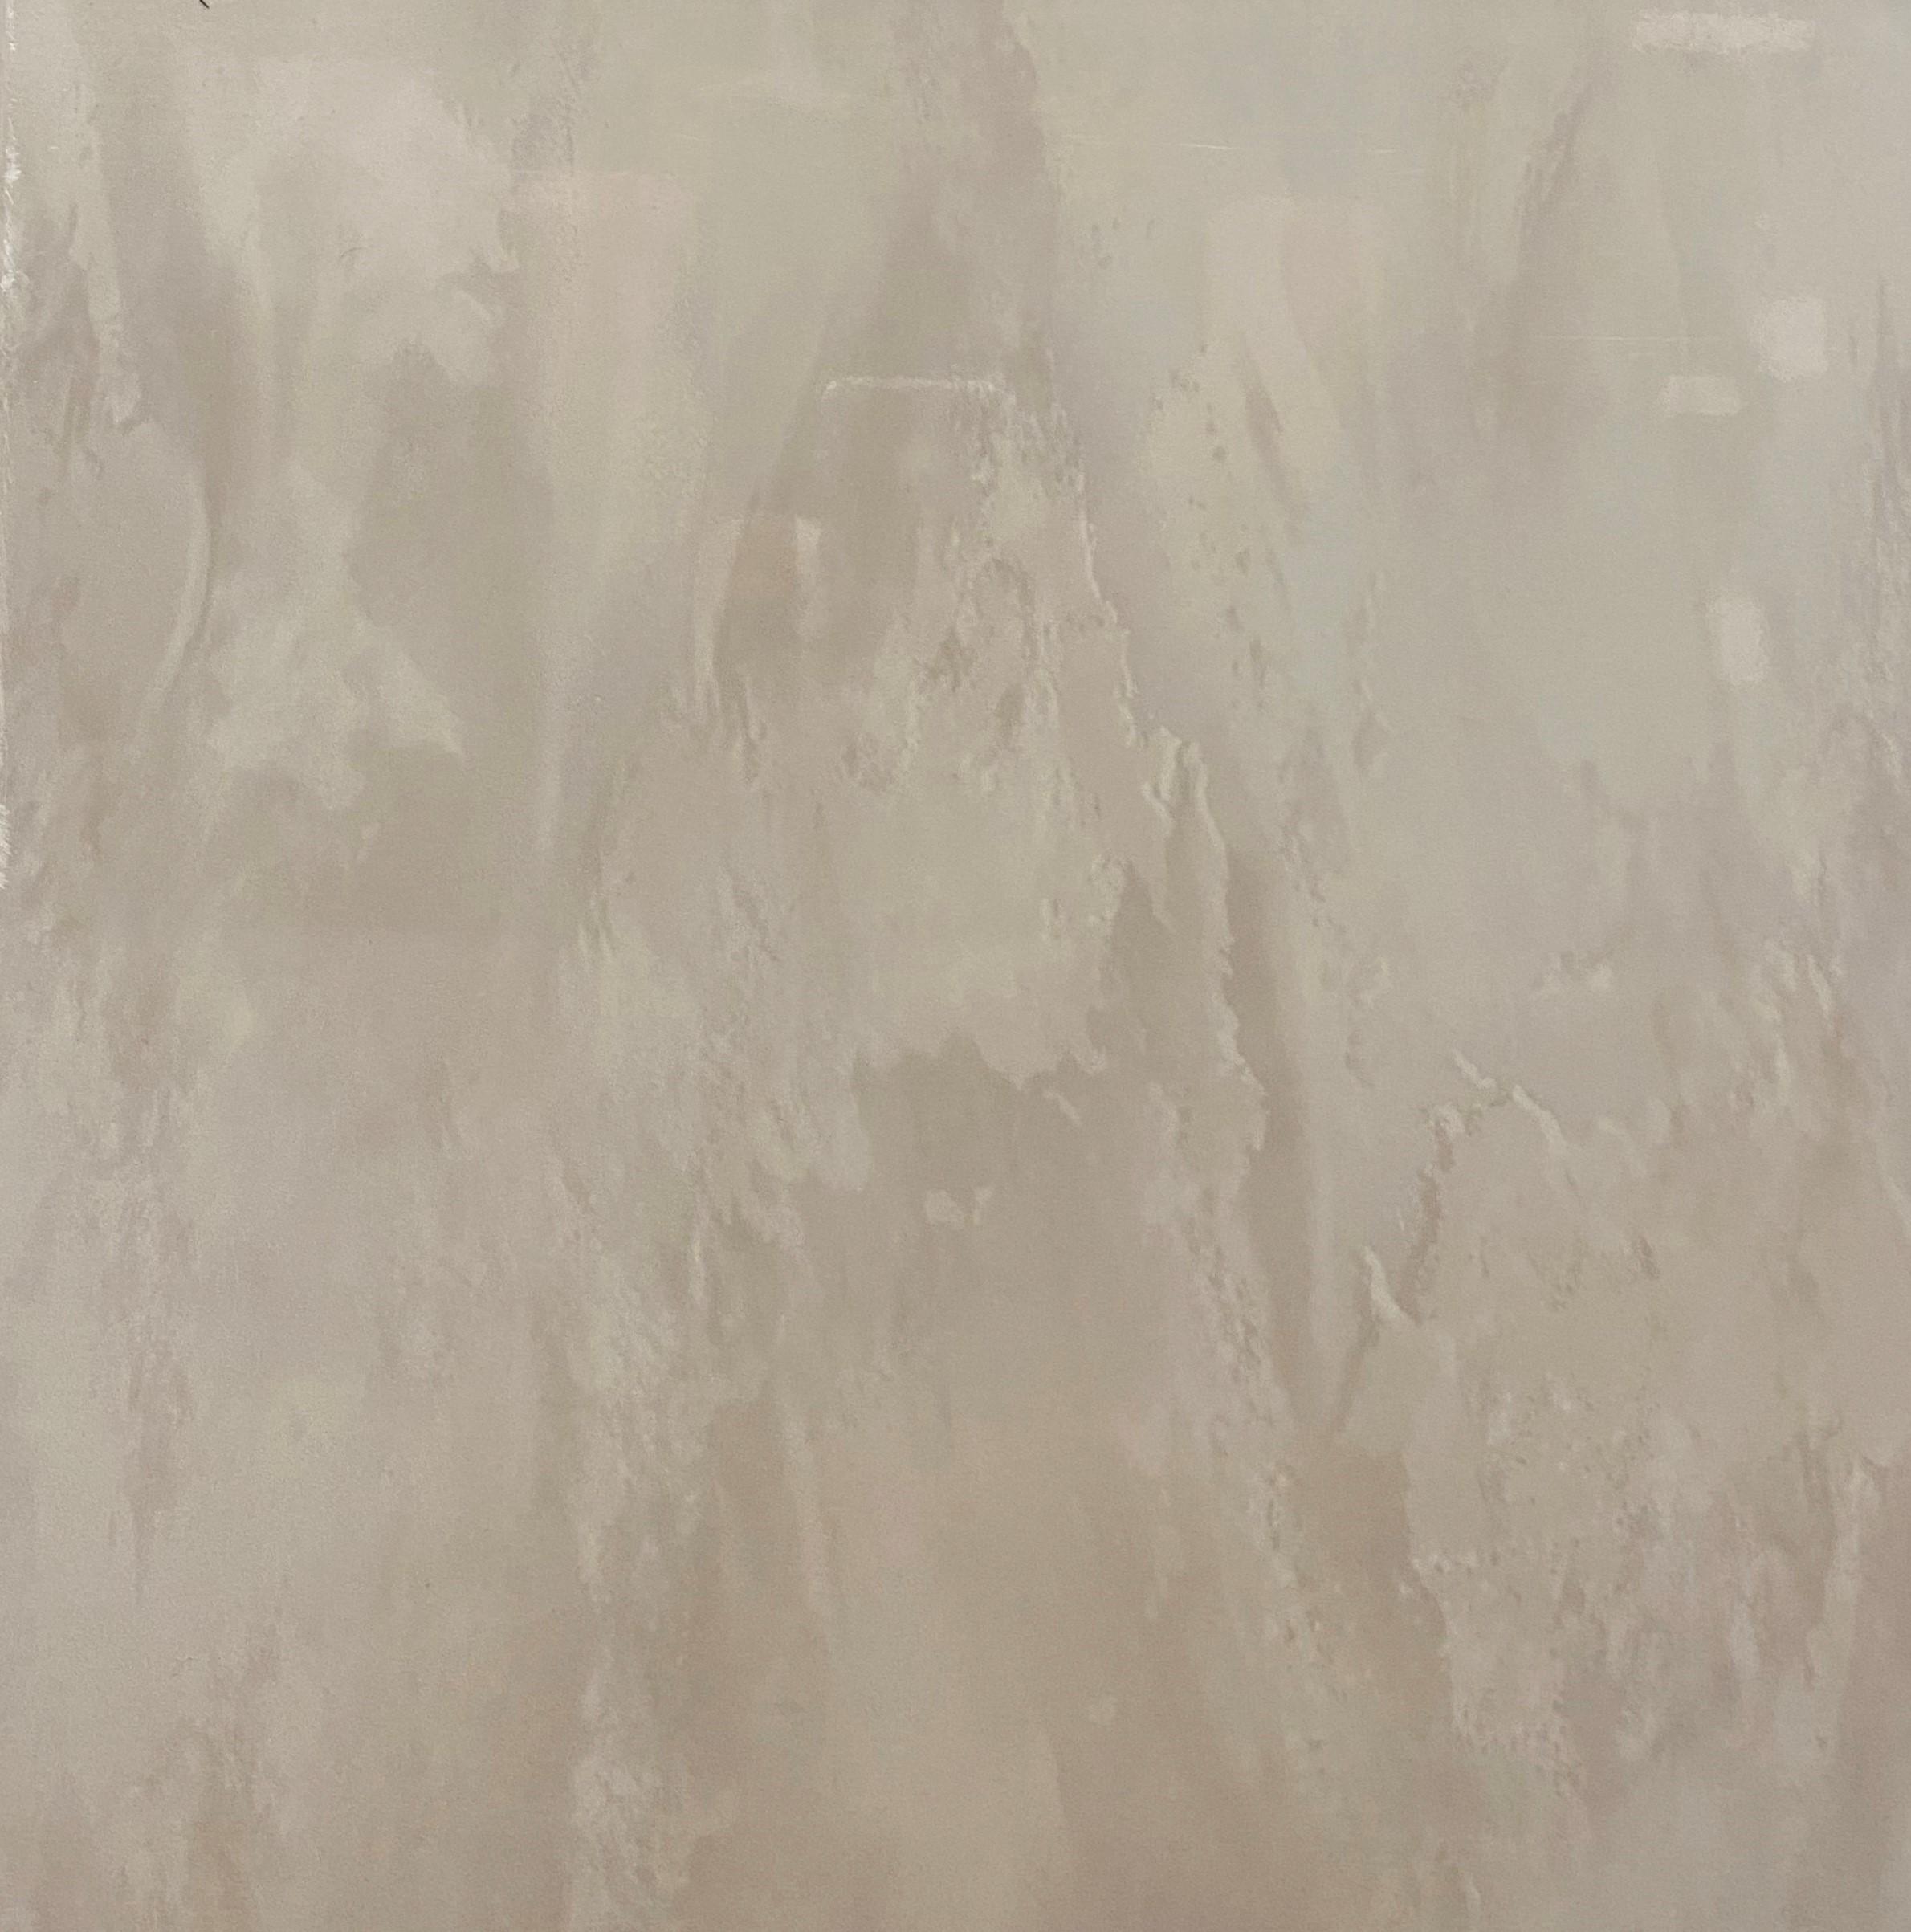 Mocha Gloss Non Rectified Porcelain Floor Tile 400x400mm 3592